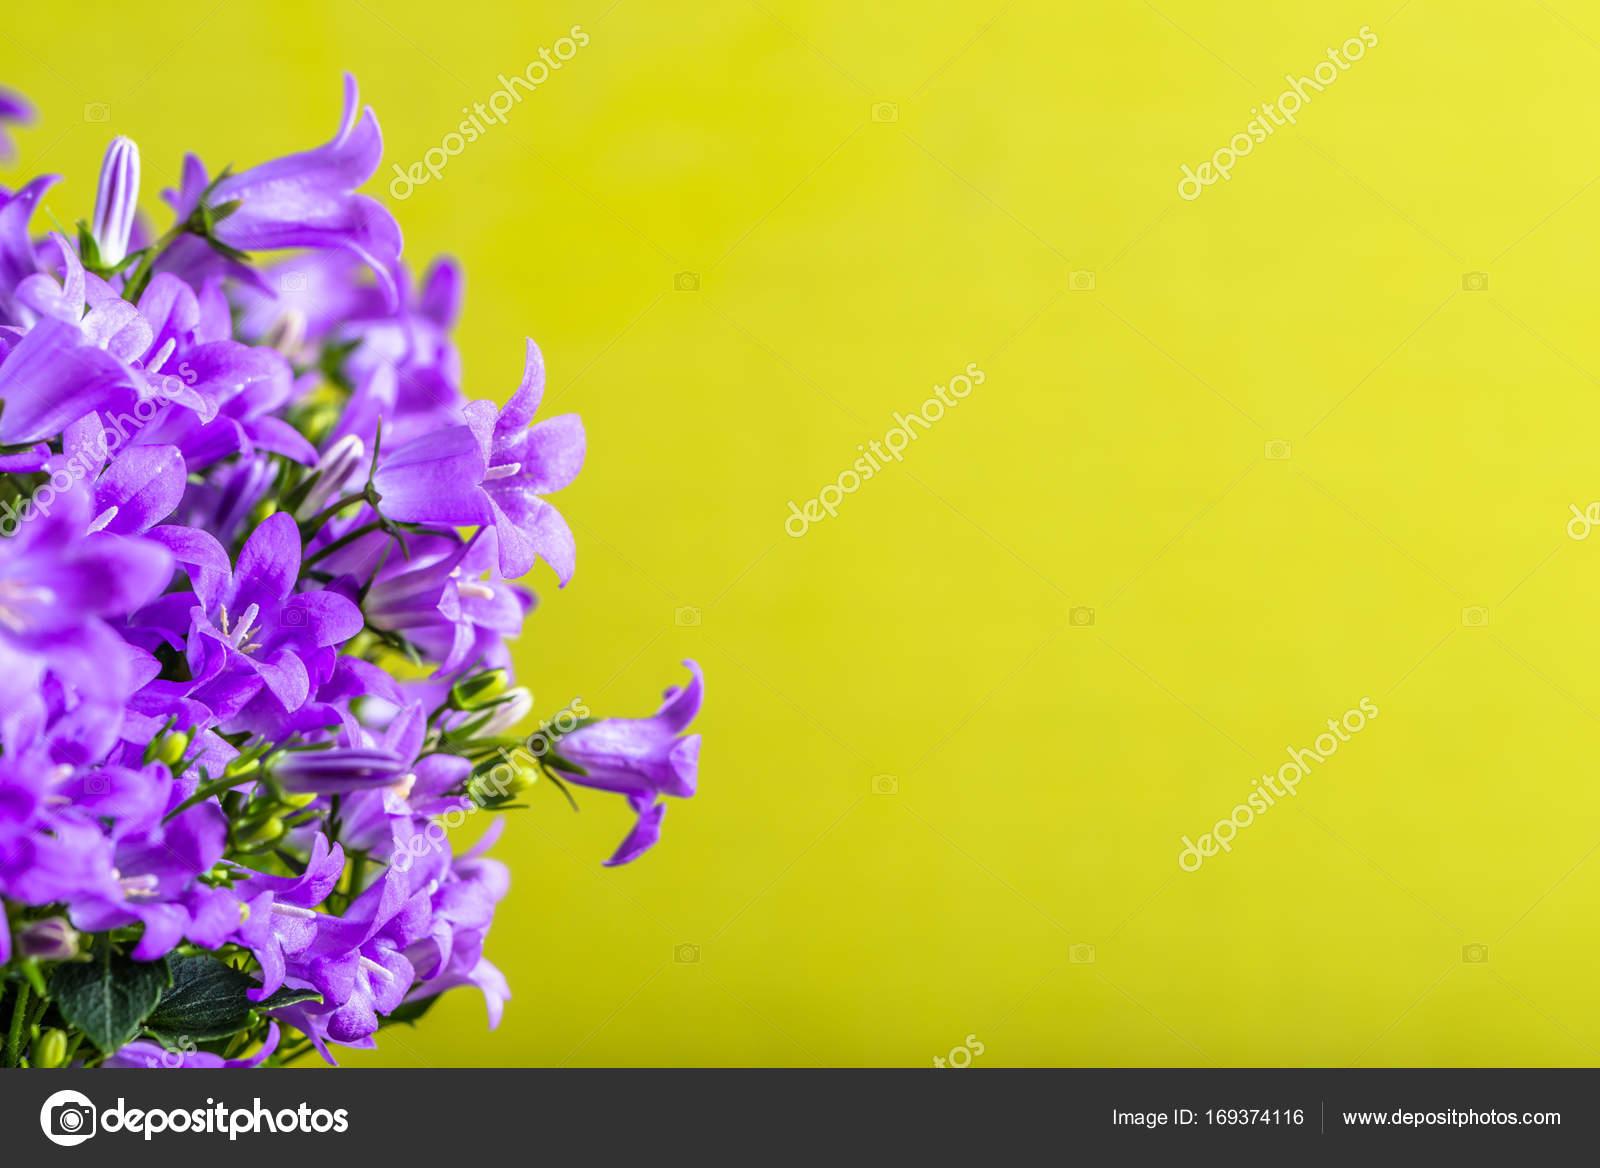 Spring Flowers Background With Copy Space Stock Photo Alicjane